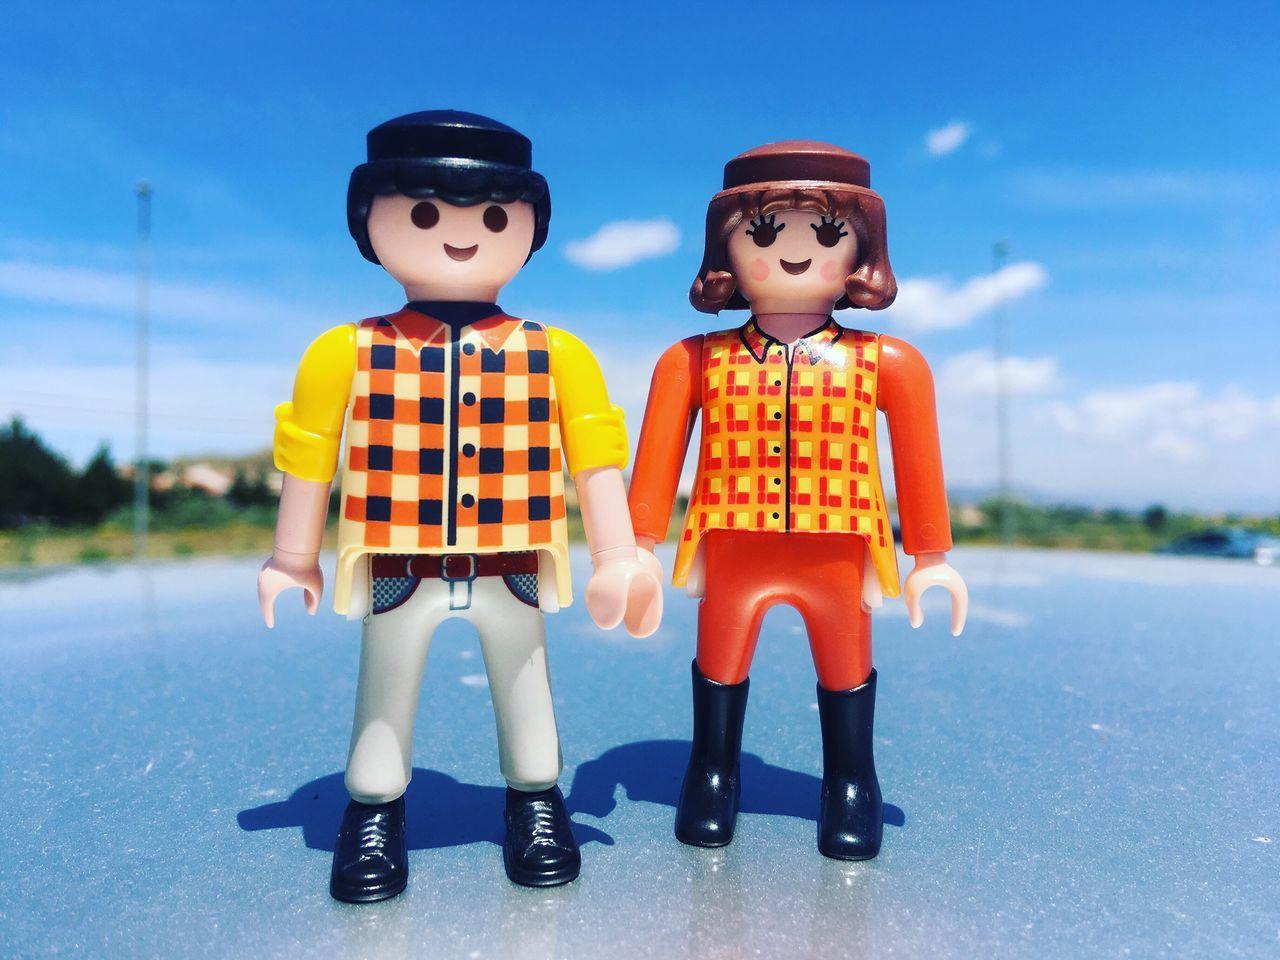 Playmobil Toys Coleccion Vintage Photography Photo Picoftheday